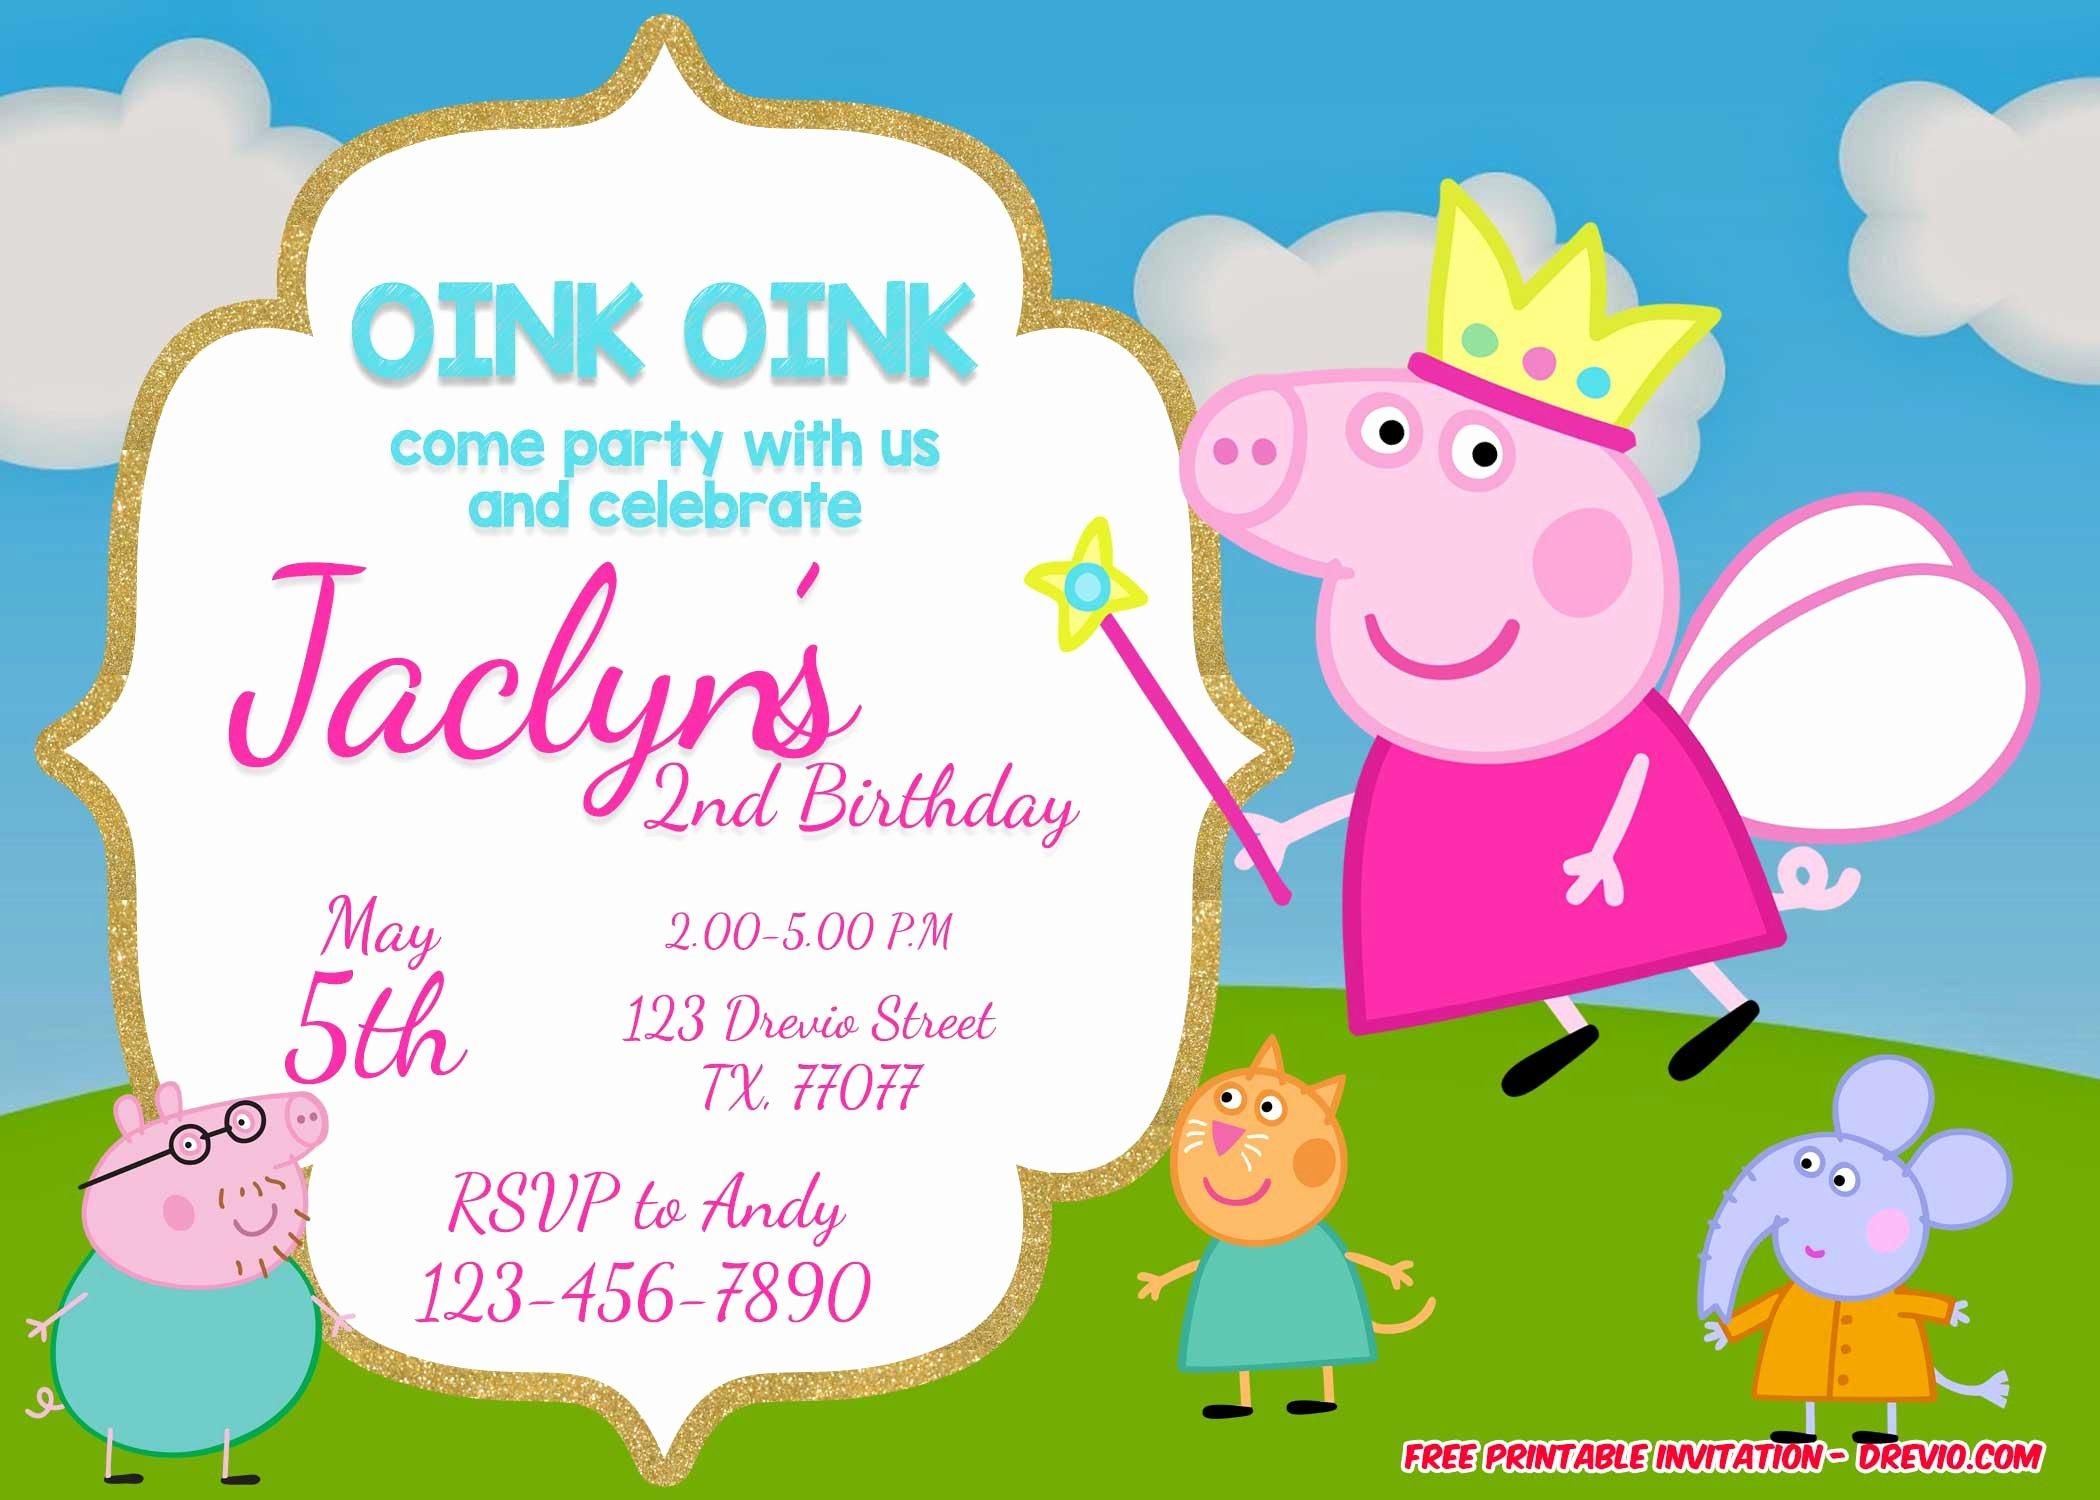 Free Party Invitation Templates Luxury Free Printable Peppa Pig Invitation Birthday Templates